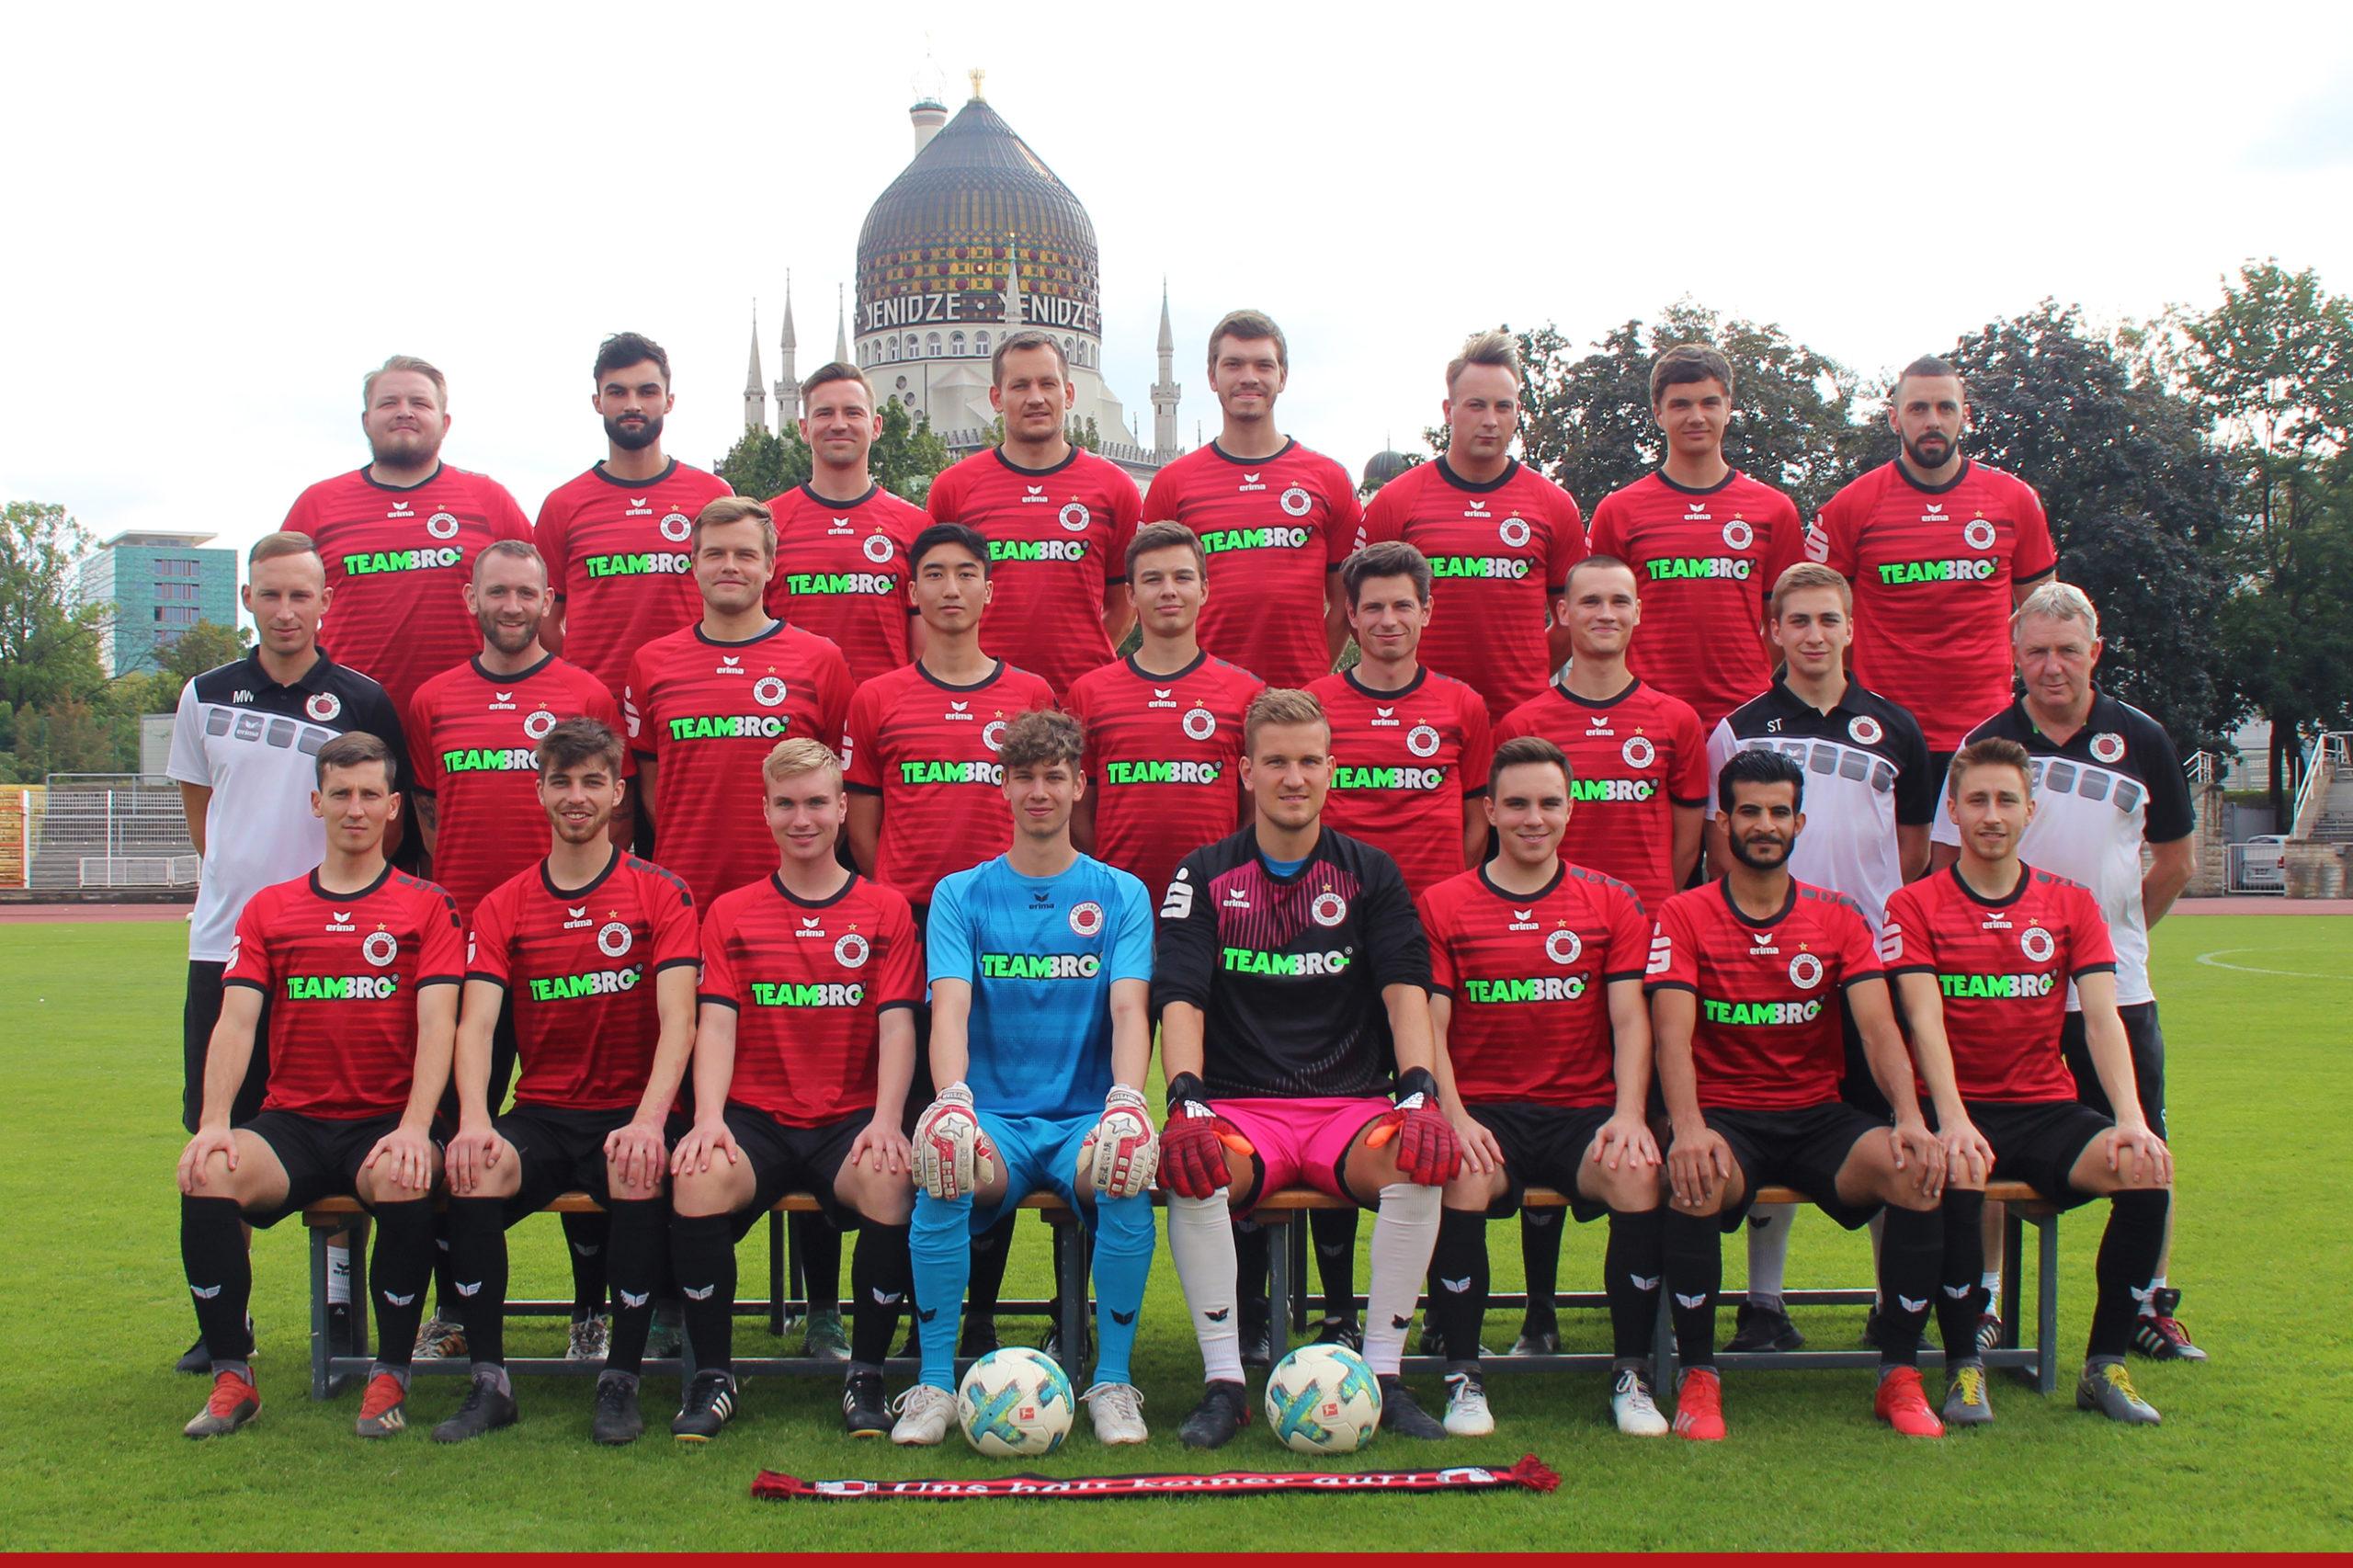 Mannschaftsfoto Dresdner SC 1898 Saison 2020/21